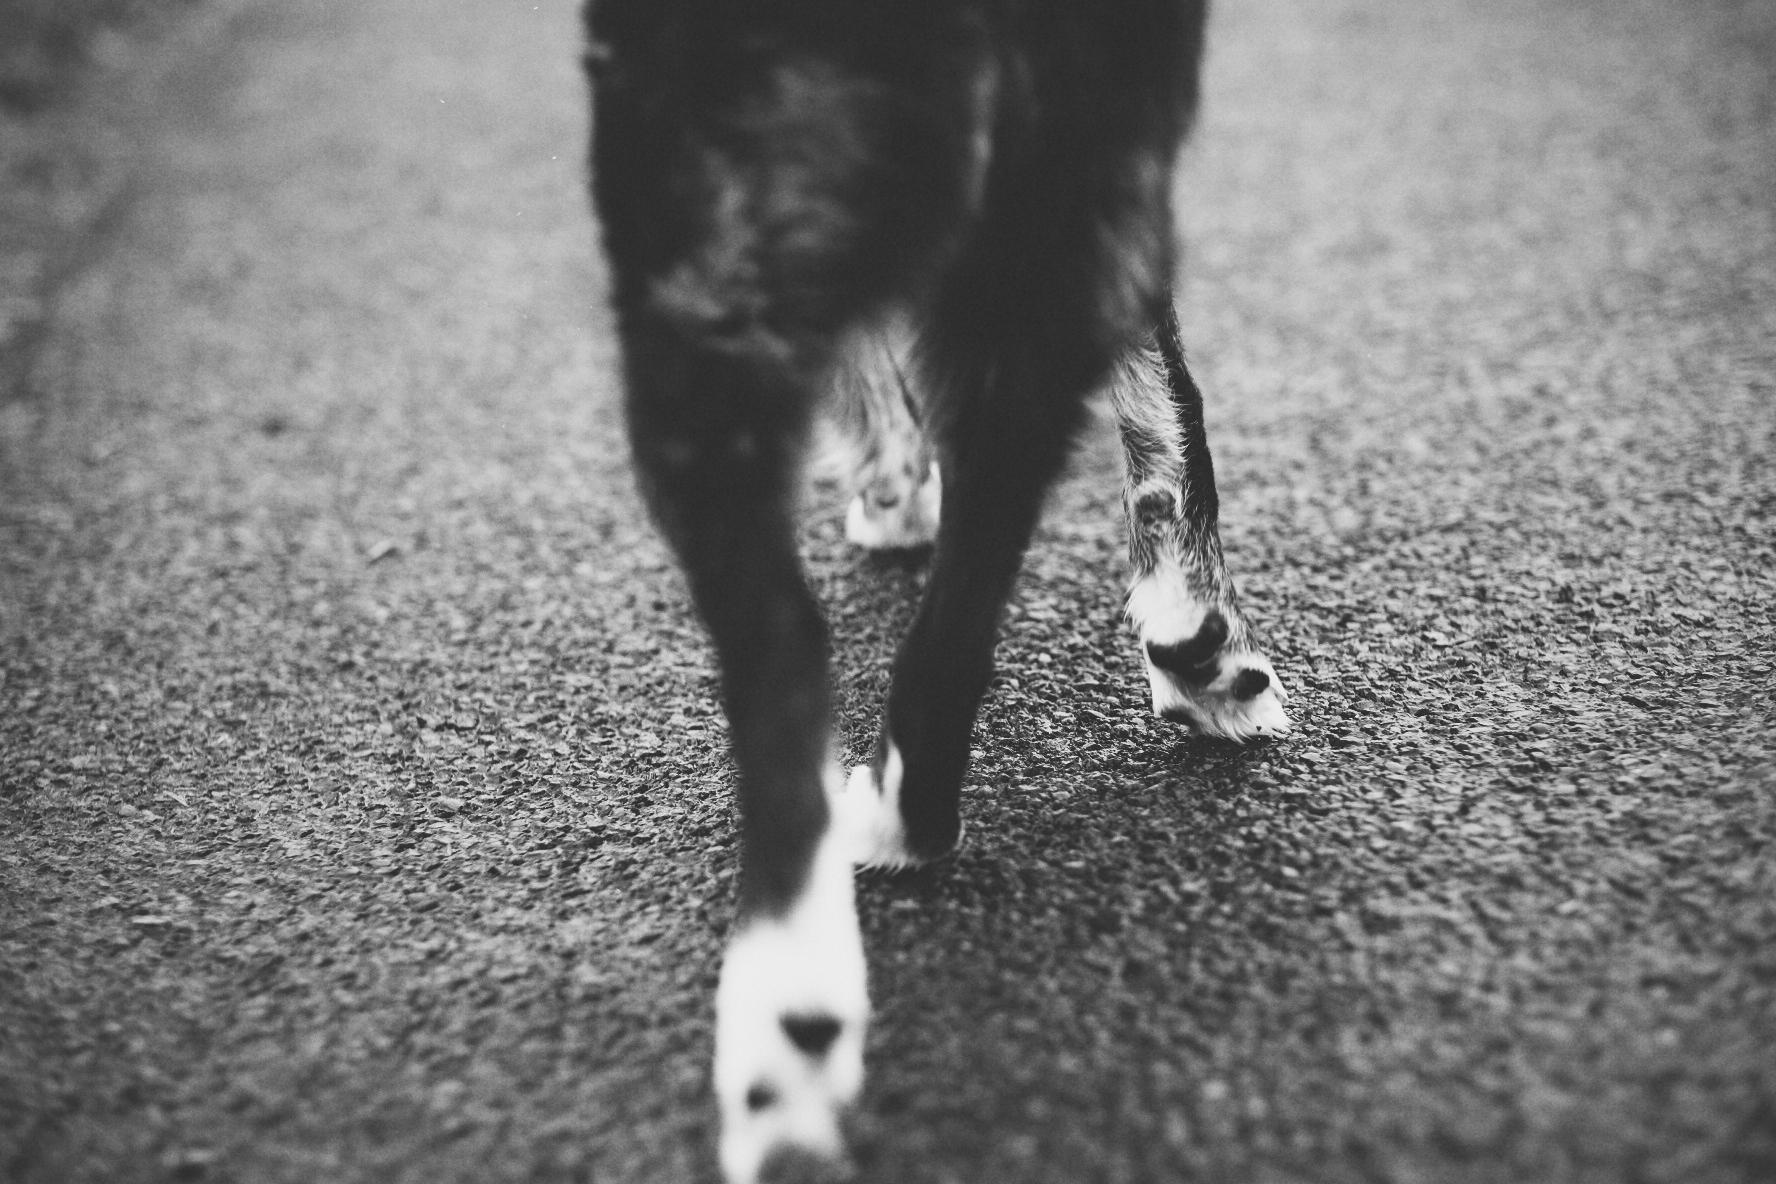 6. Walks